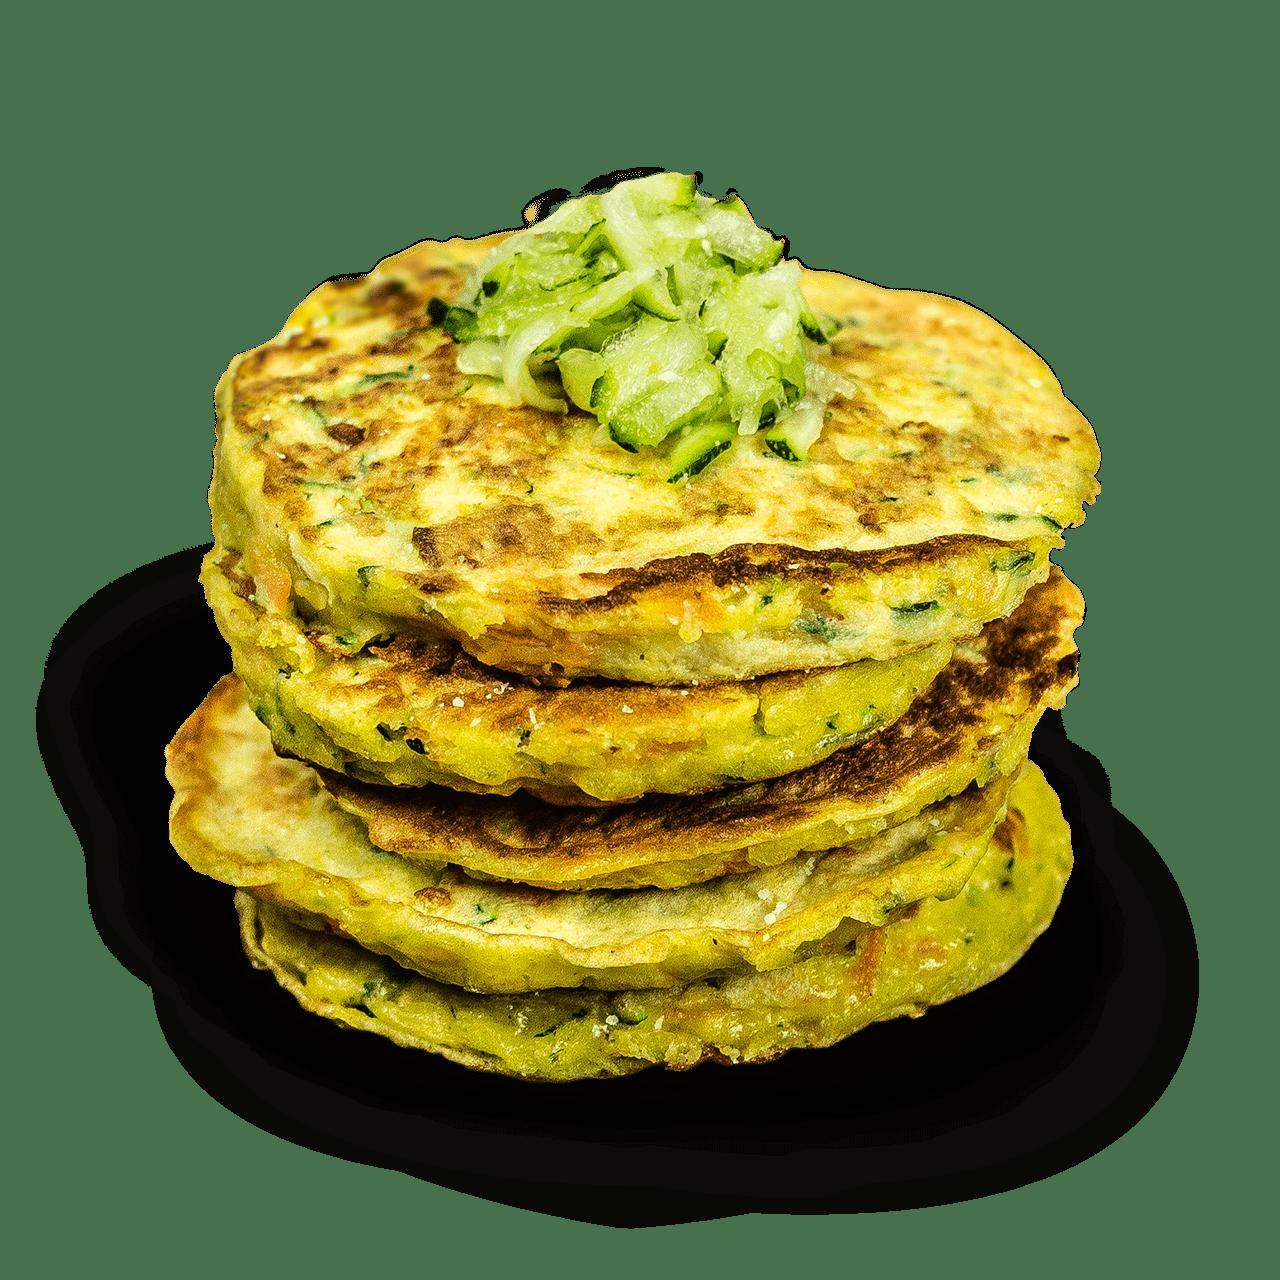 tostibanaan-groente-omeletjes-courgette-wortel